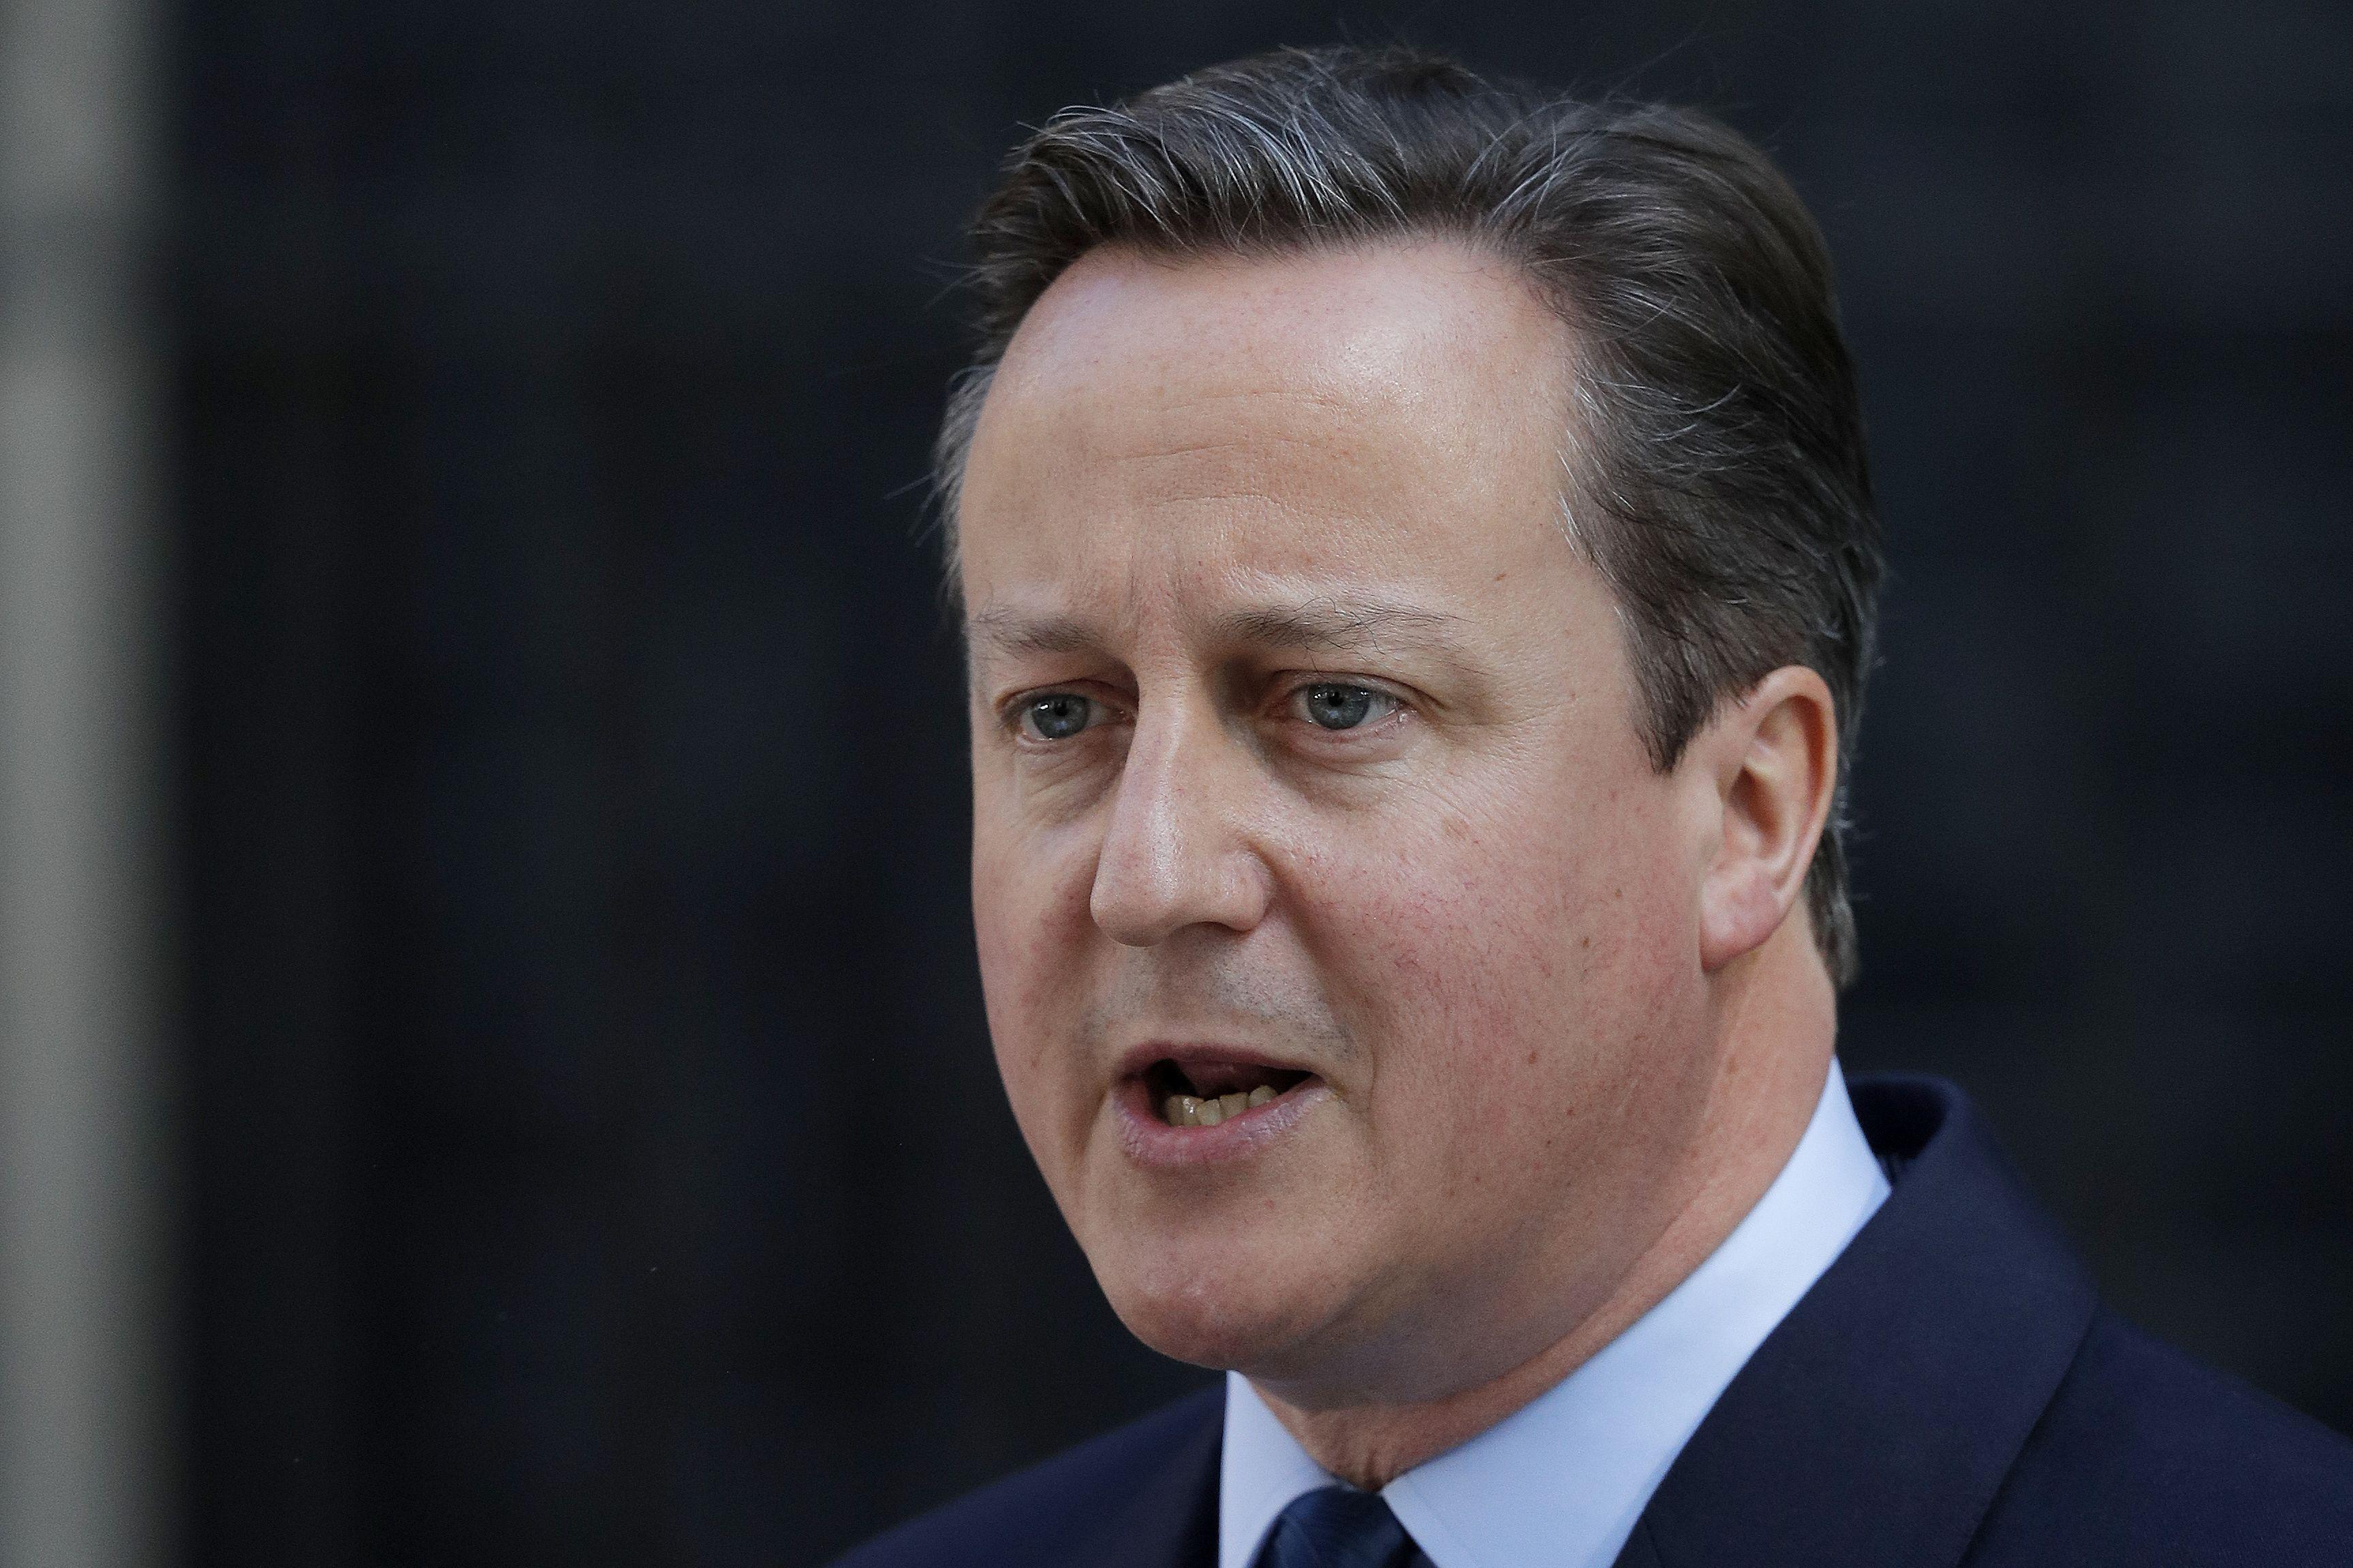 David Cameron High Definition Wallpapers